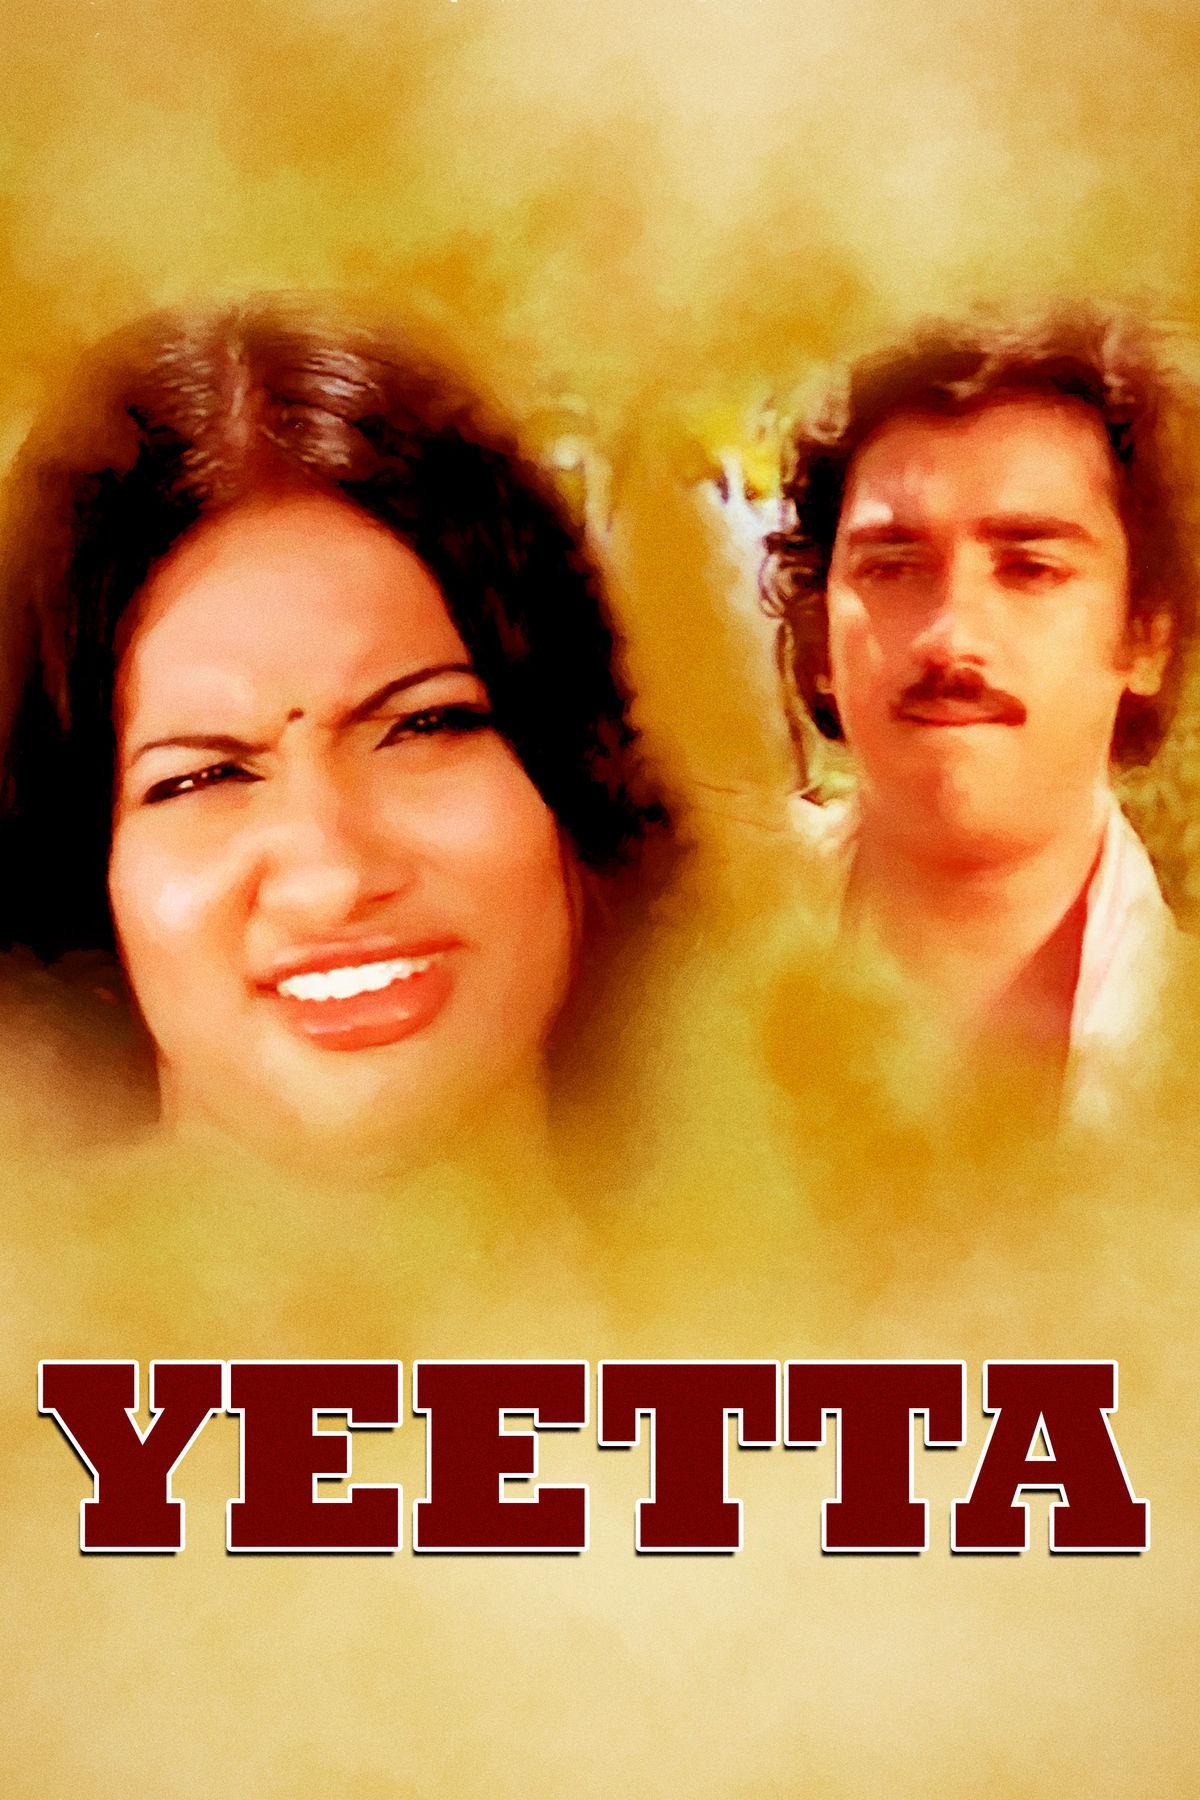 Kottayam Santha Best Movies, TV Shows and Web Series List